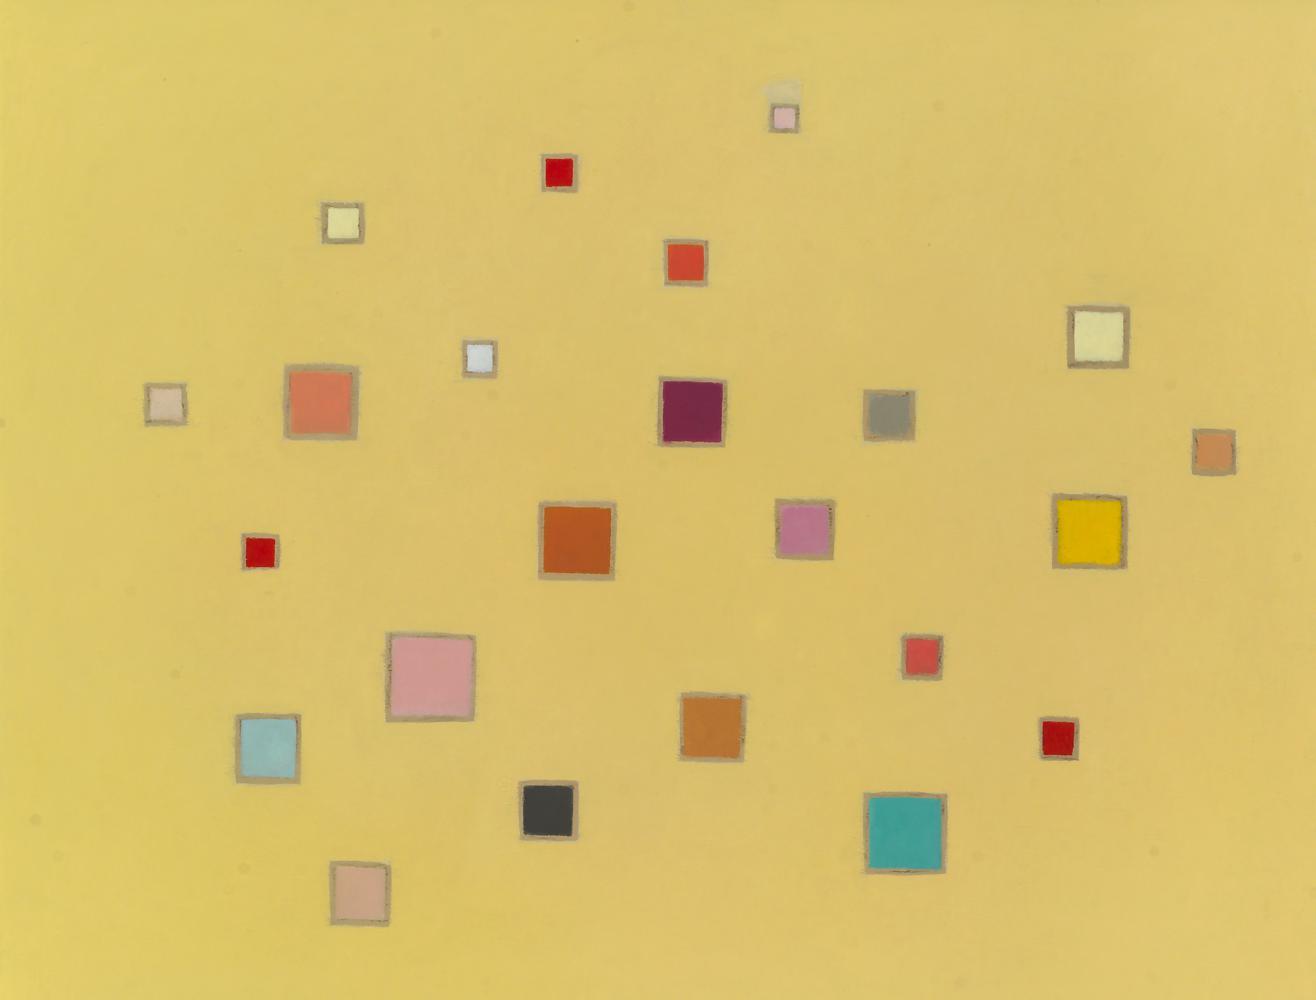 Música, 61 x 76 cm, óleo madera, 2009.